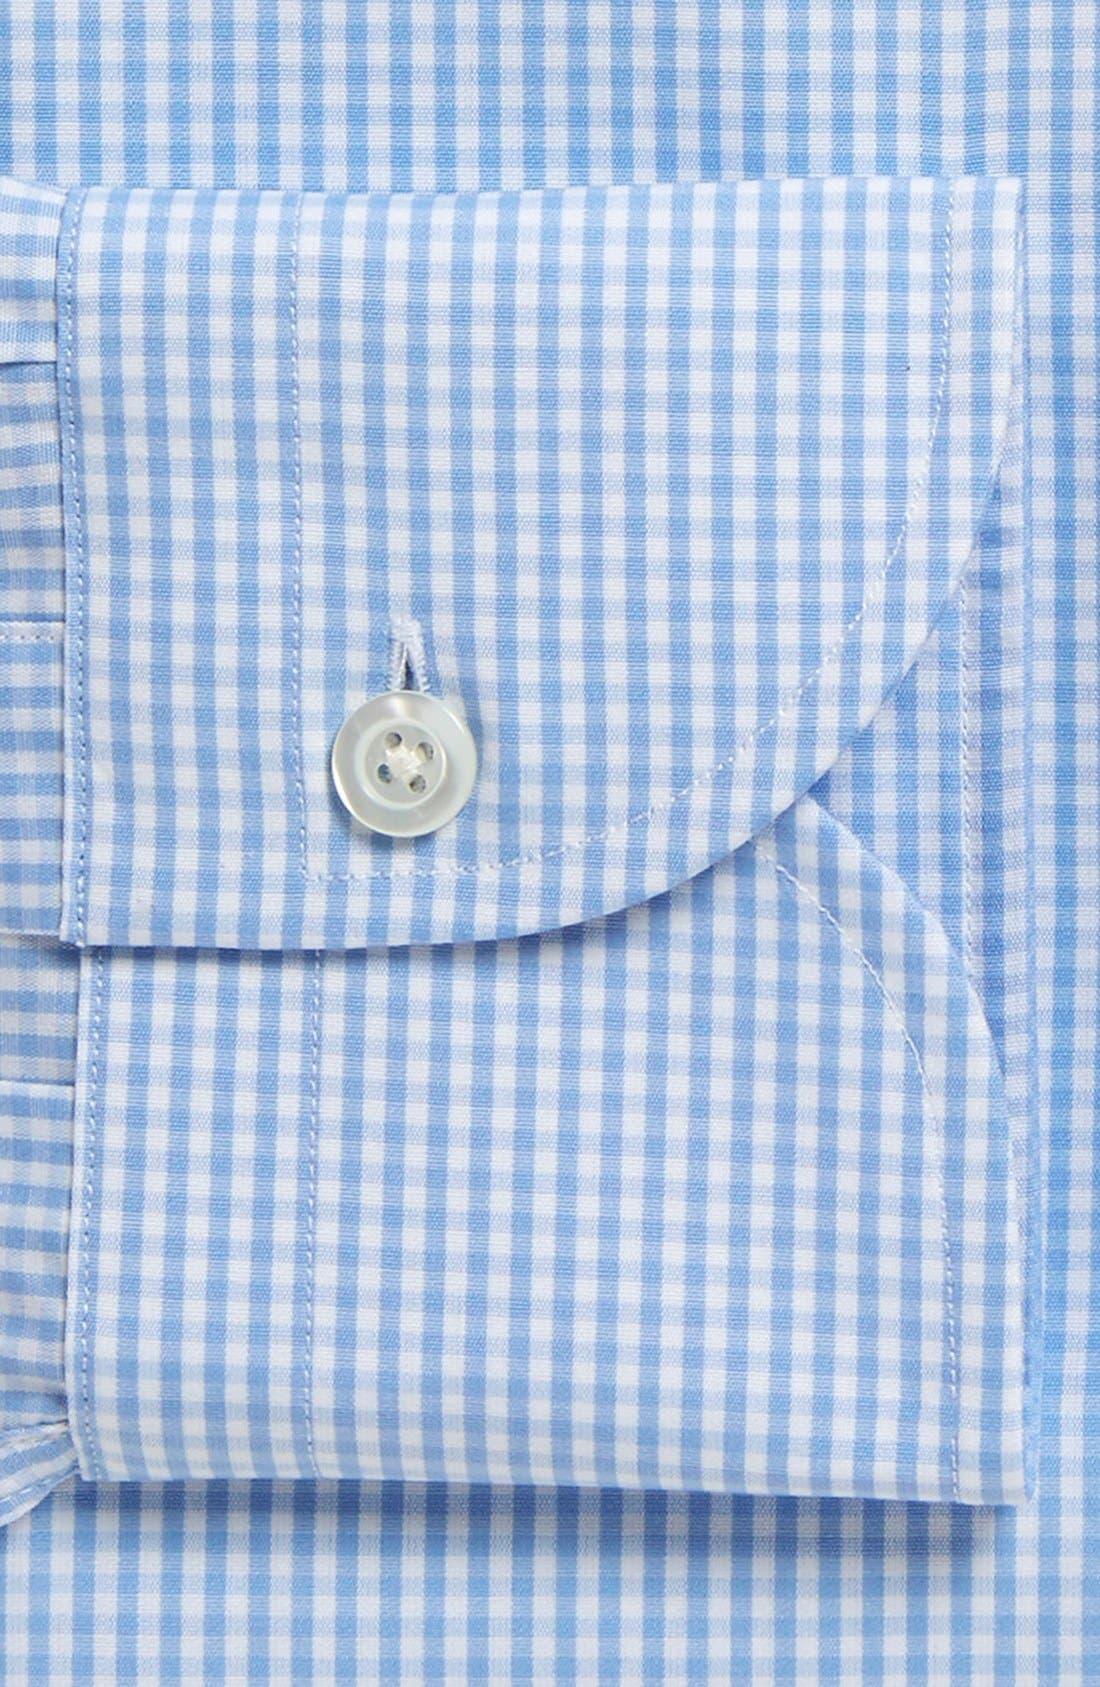 'Blue Gingham' Slim Fit Check Dress Shirt,                             Alternate thumbnail 2, color,                             Blue